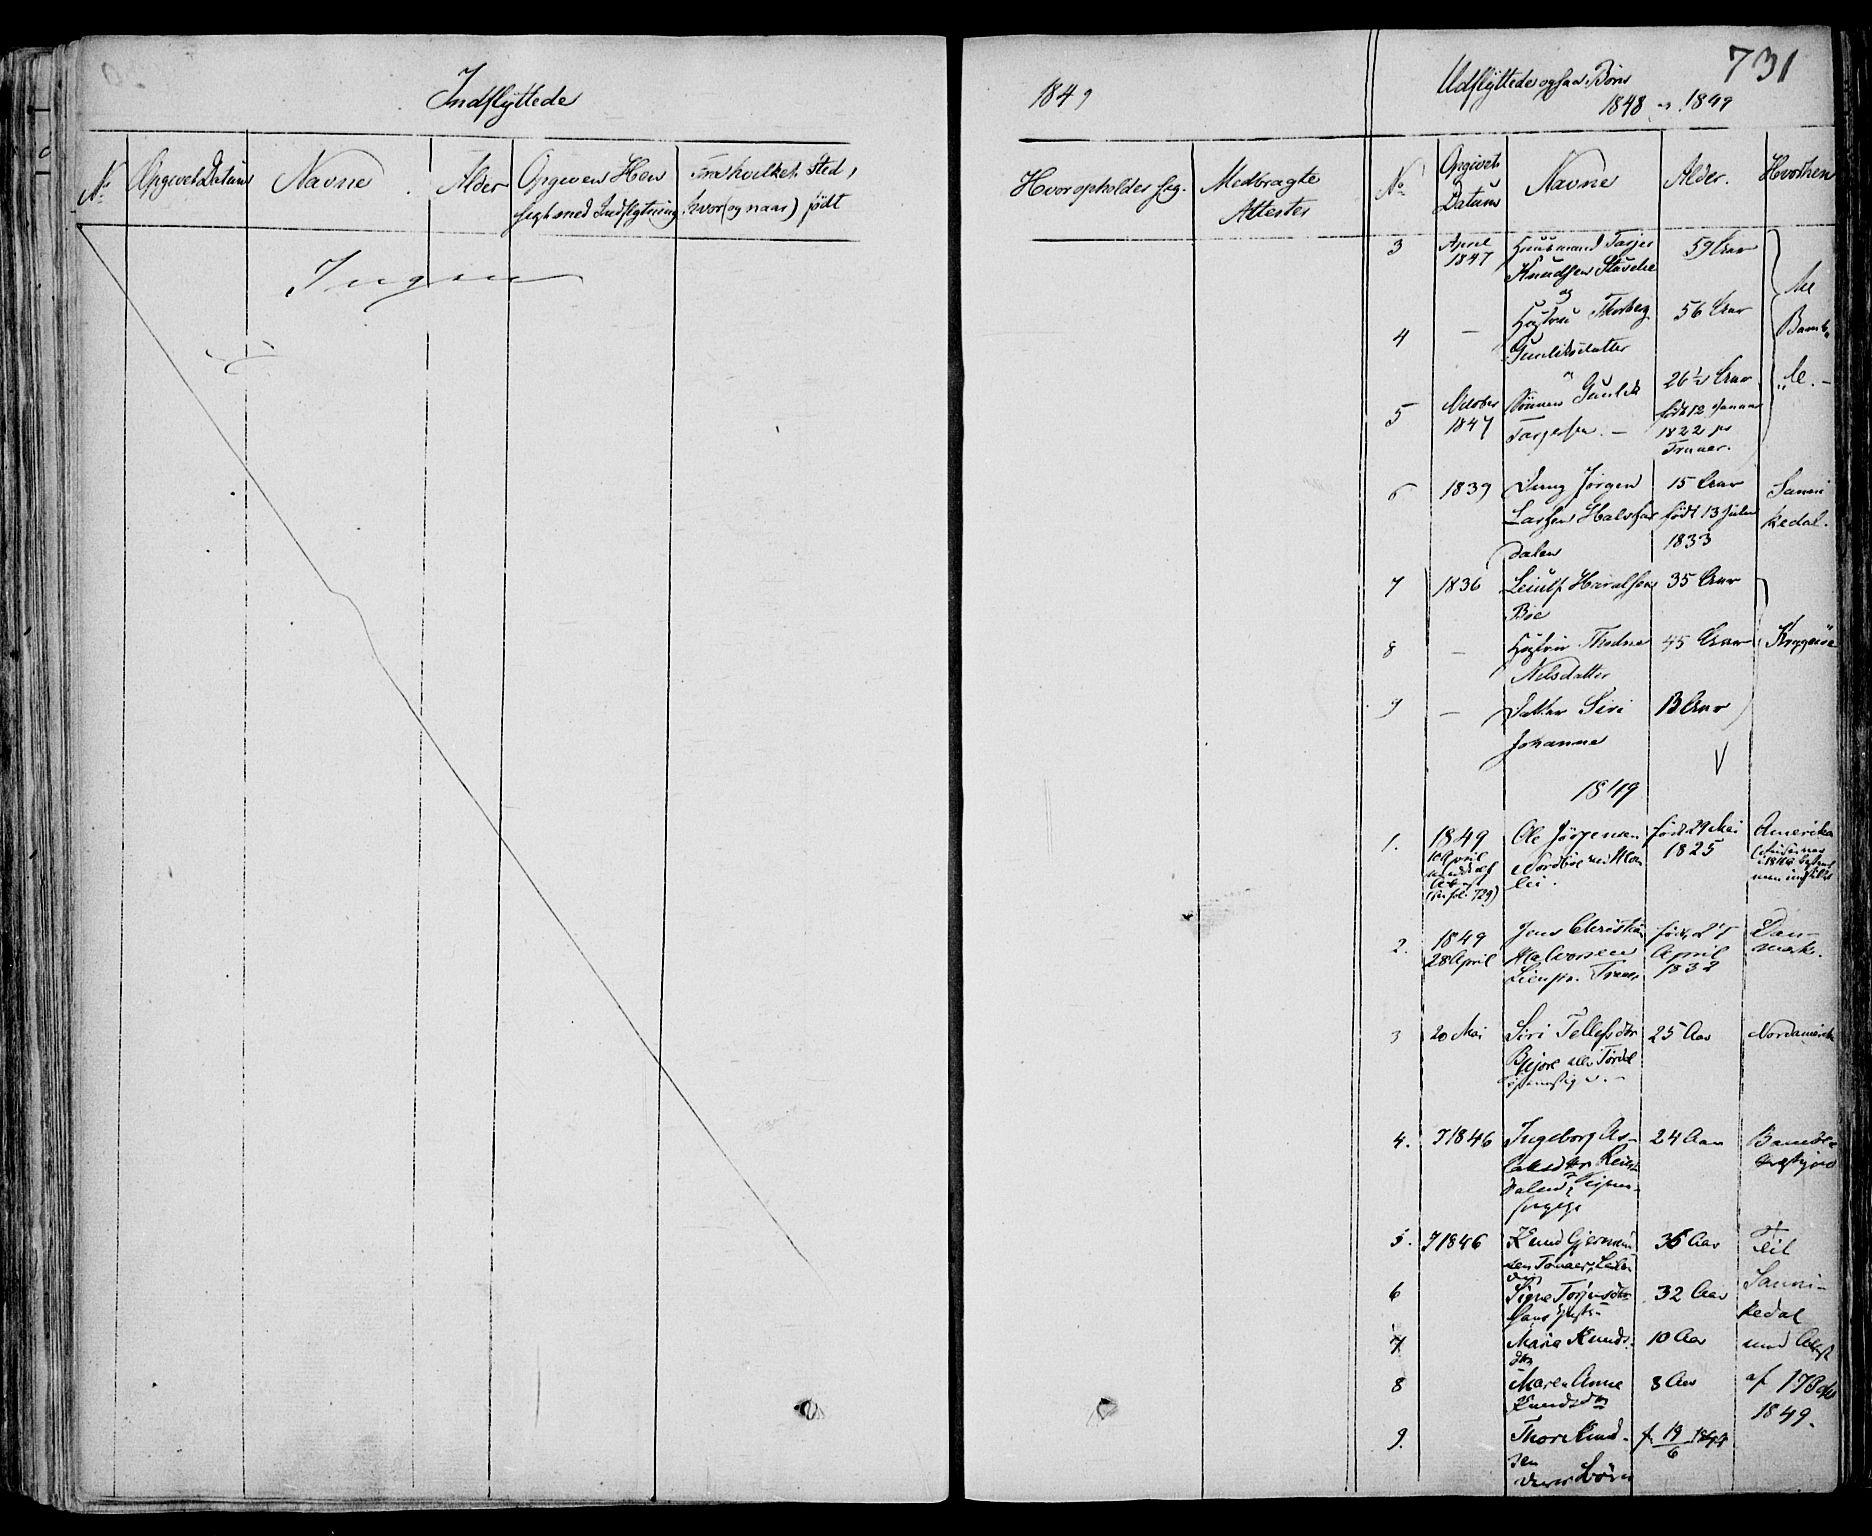 SAKO, Drangedal kirkebøker, F/Fa/L0007b: Ministerialbok nr. 7b, 1837-1856, s. 731